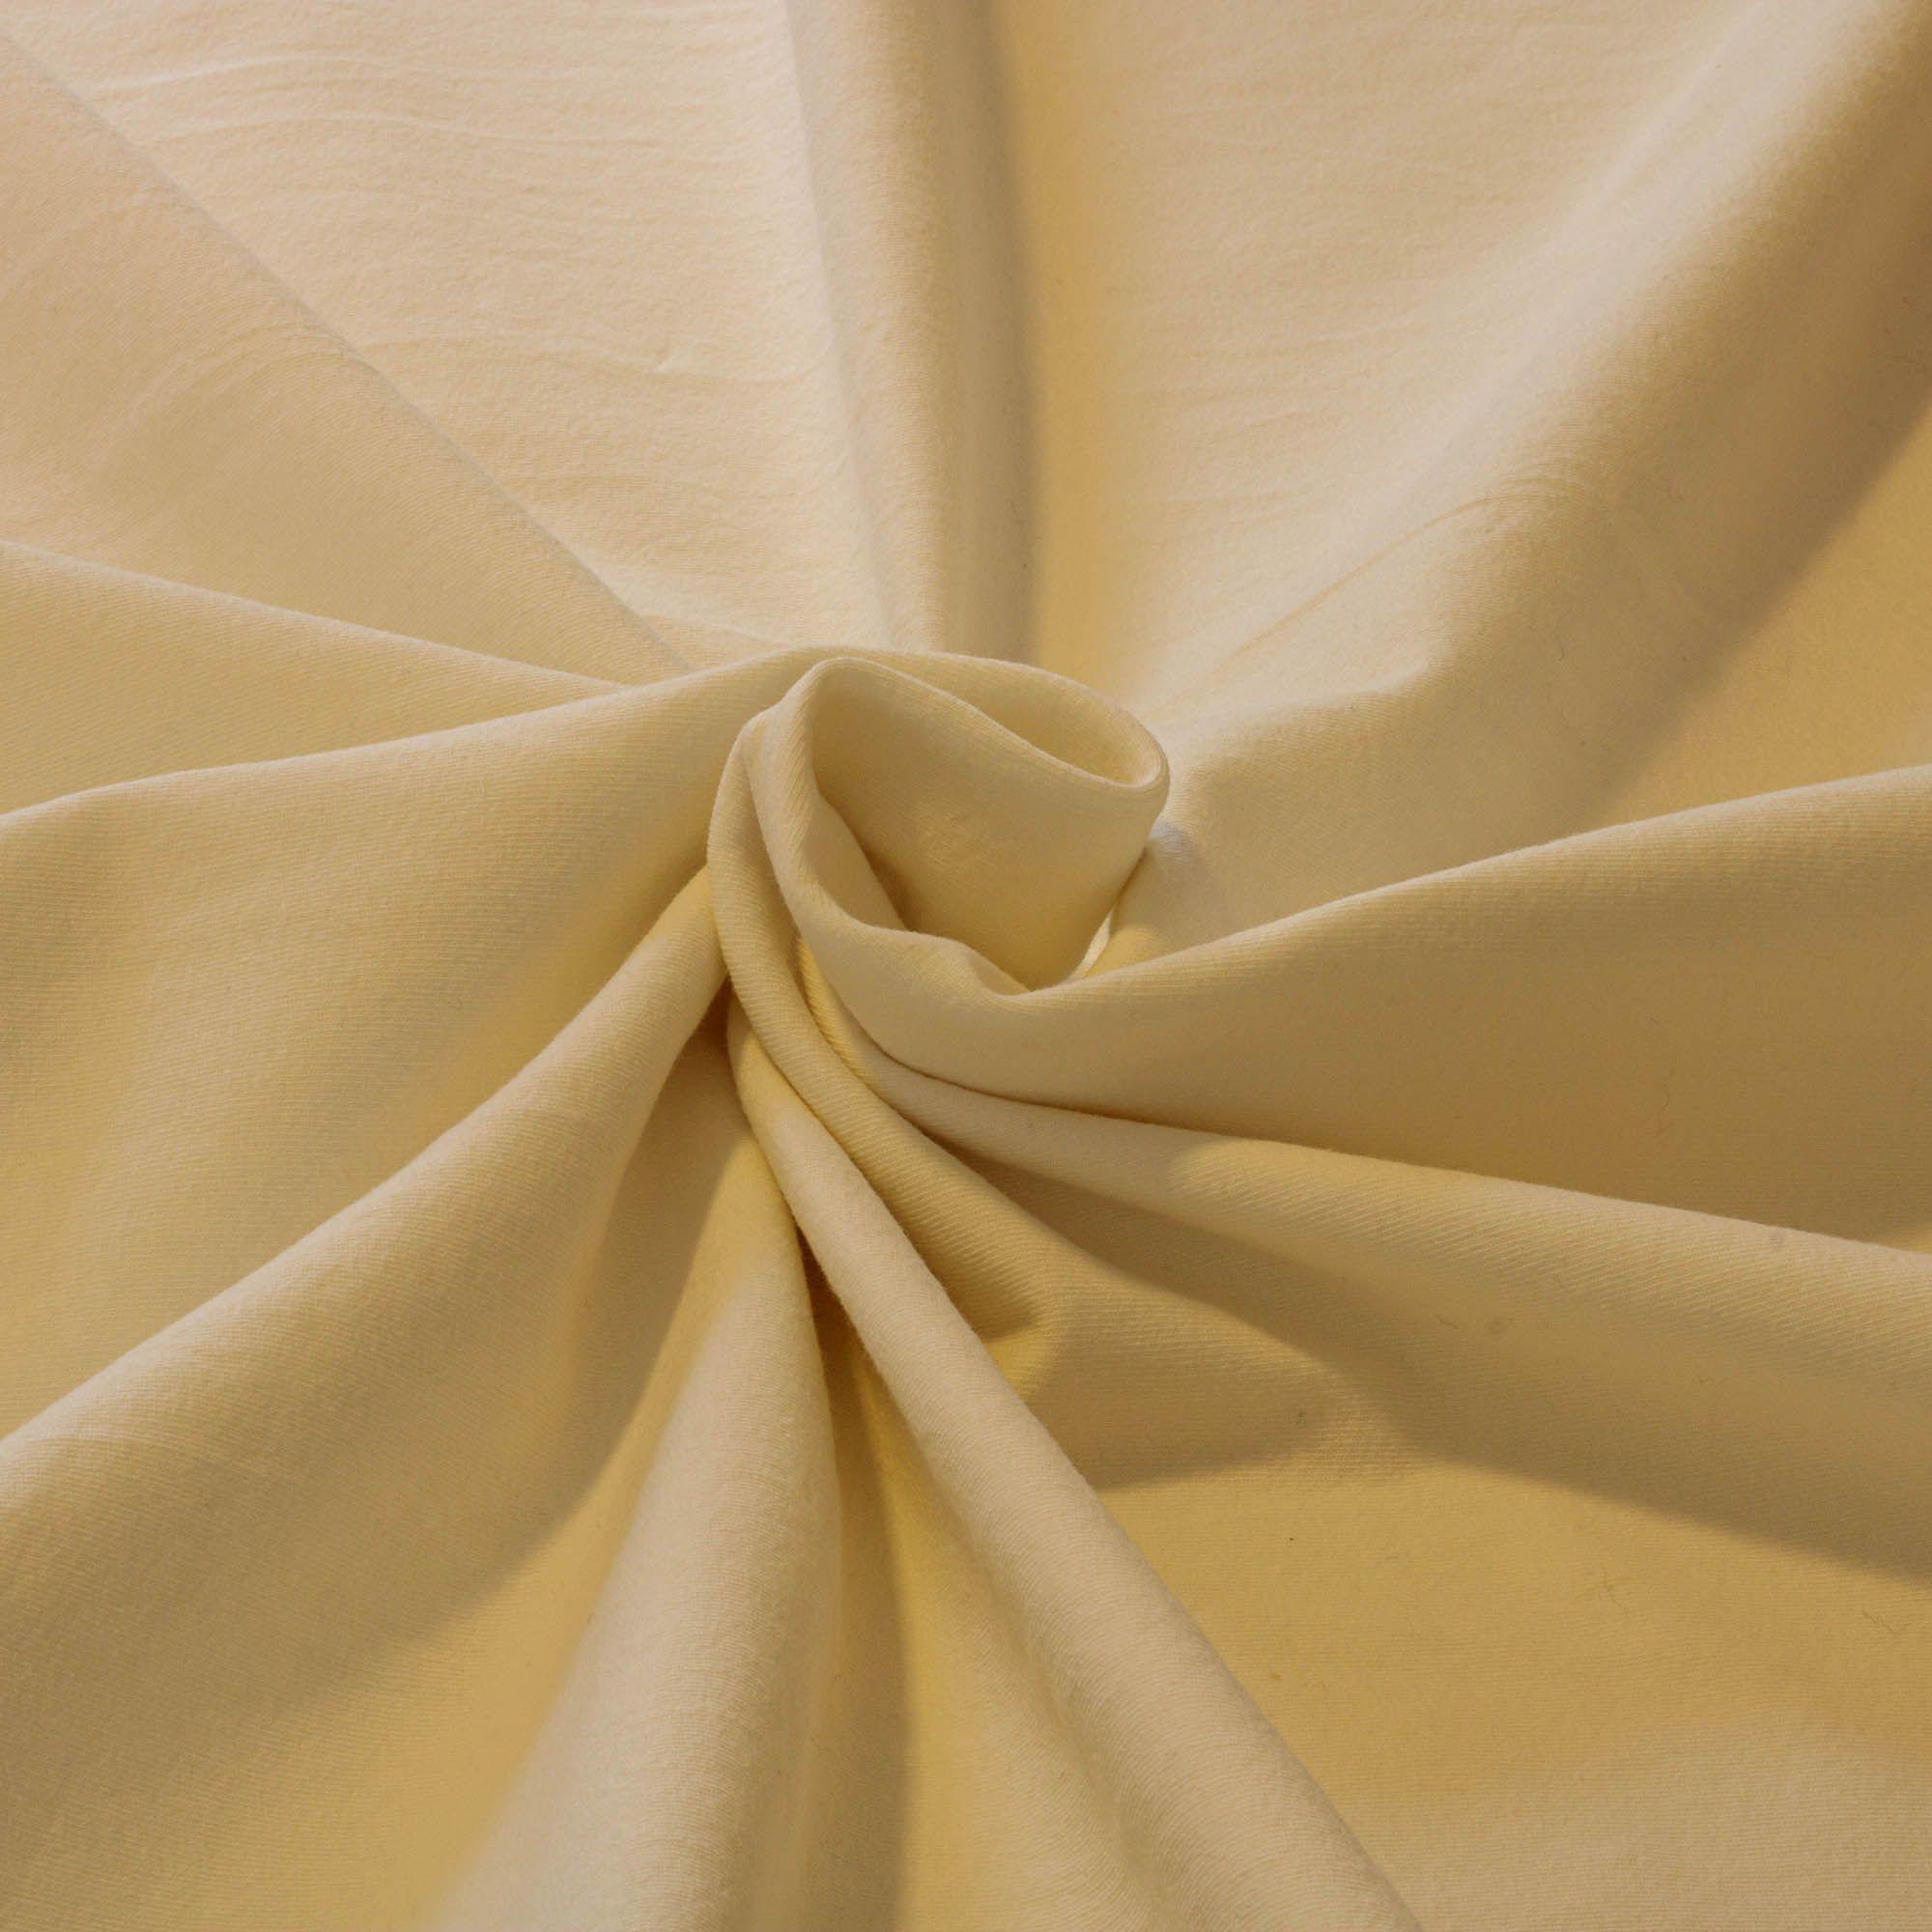 Tecido Malha Cotton Creme 1,80 Mt Largura Manteiga